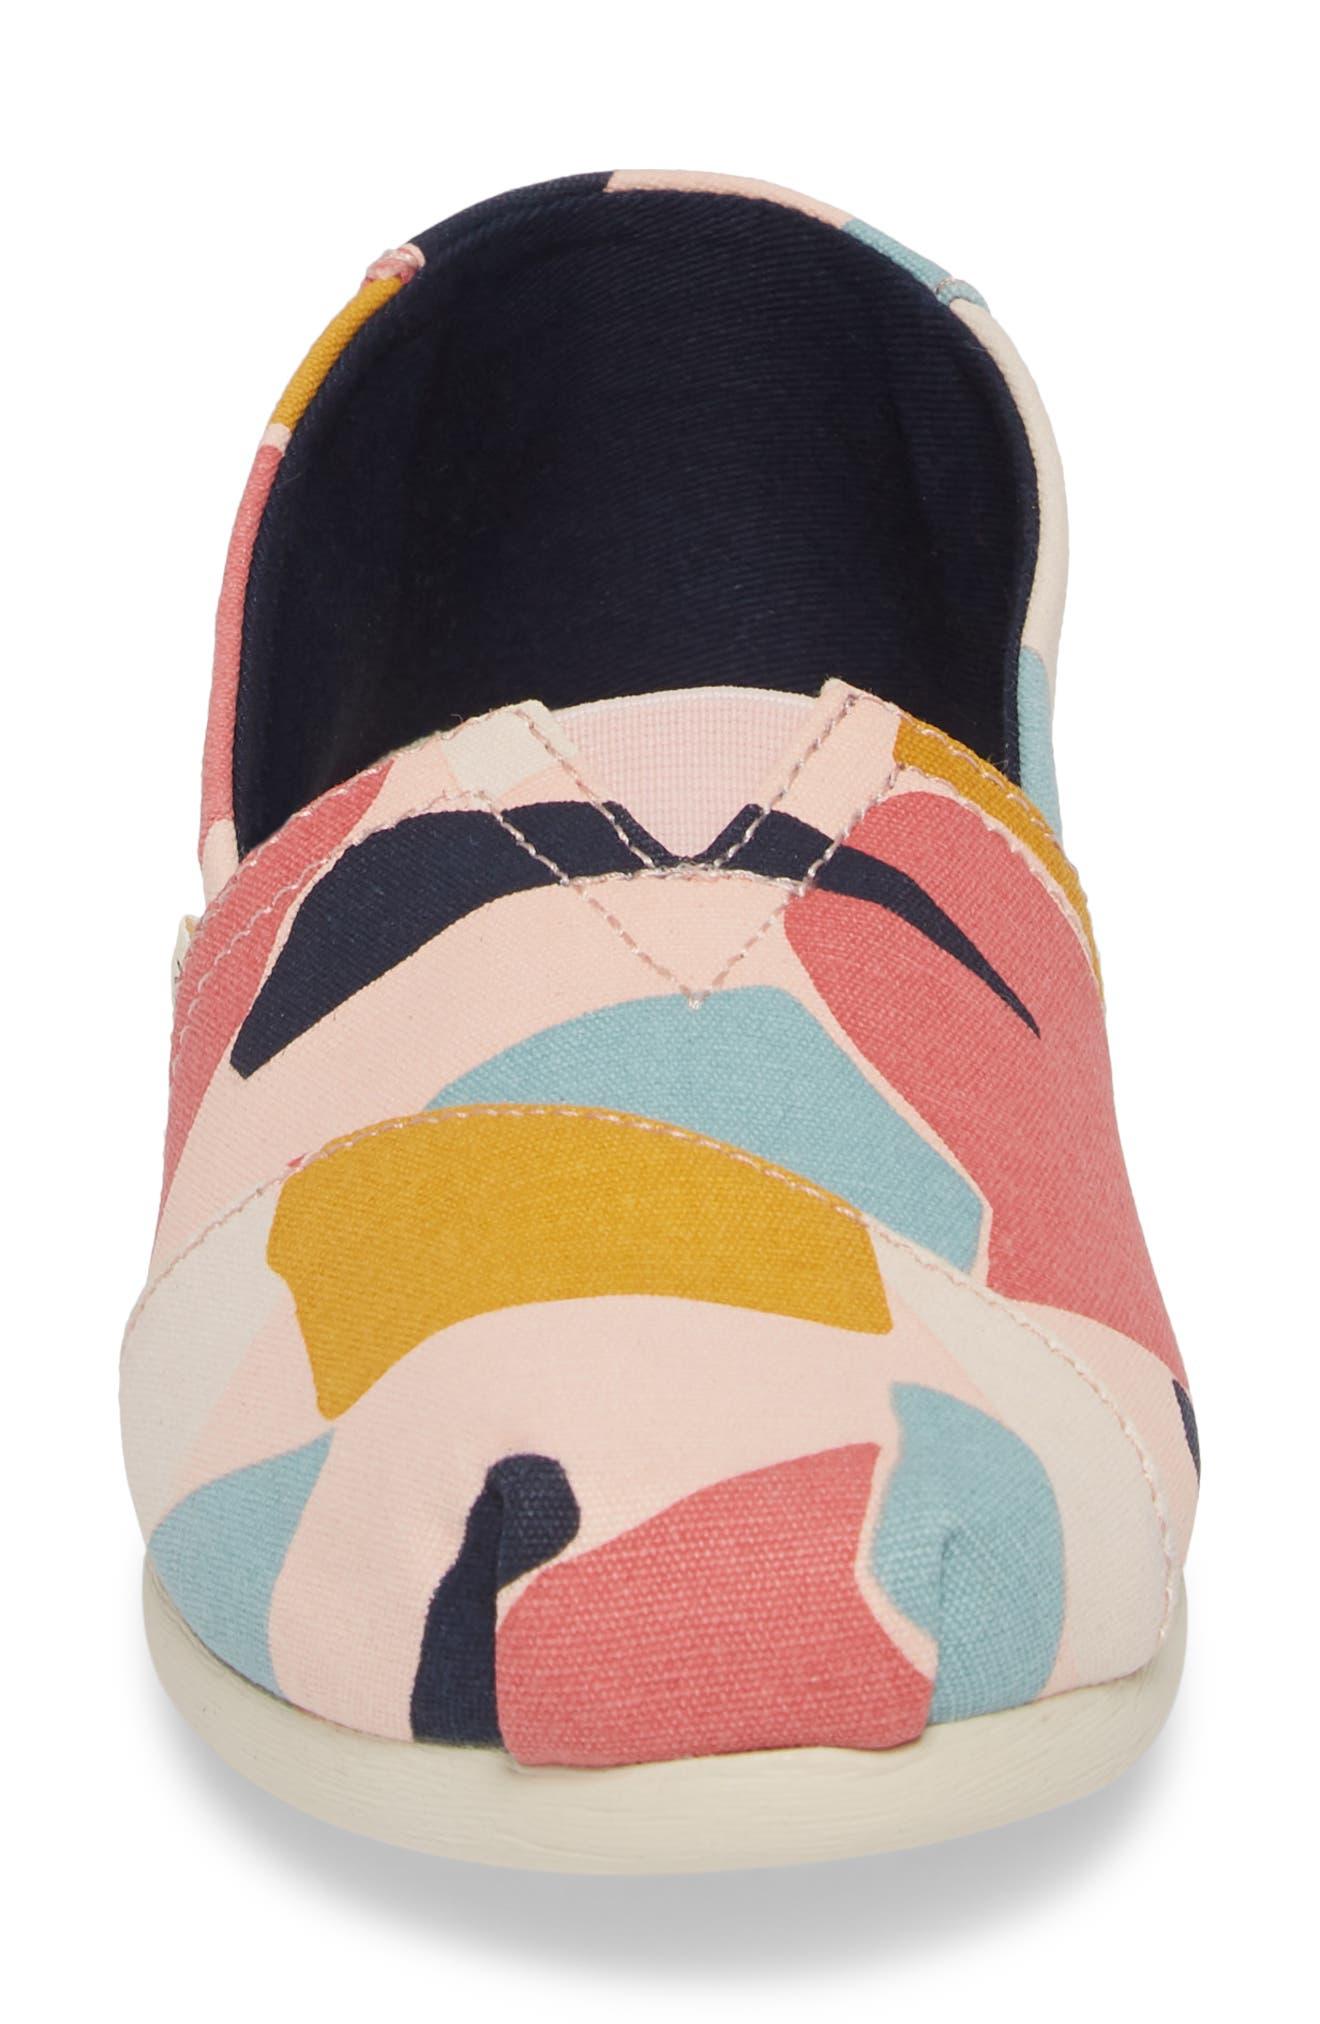 Alpargata Slip-On Sneaker,                             Alternate thumbnail 4, color,                             ROSE GLOW PRINT CANVAS